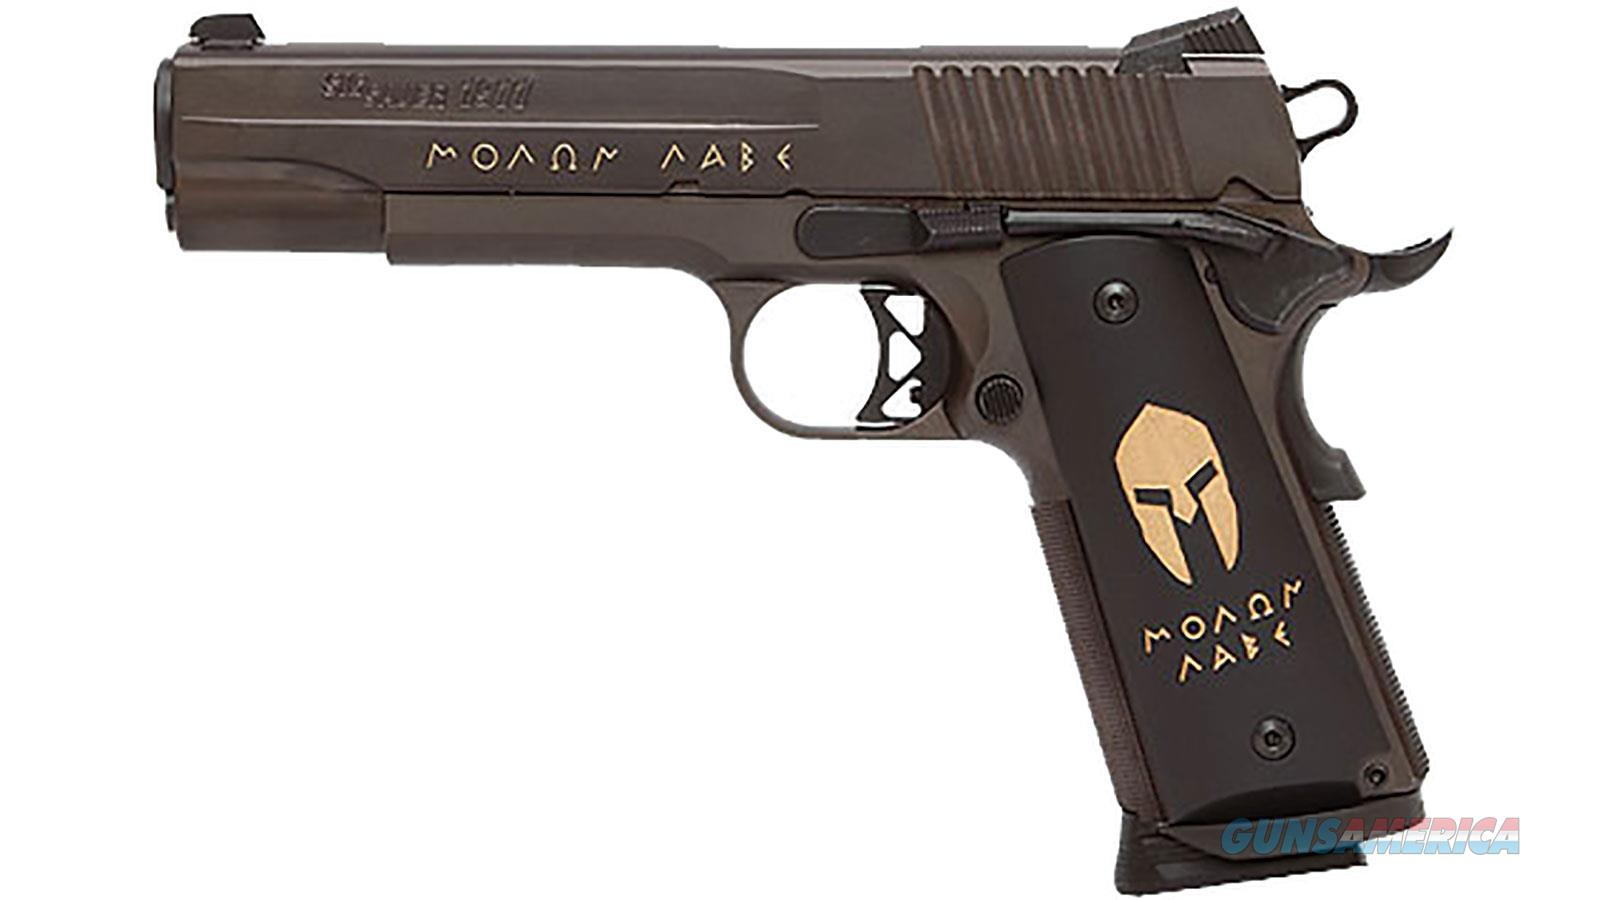 "Sig Sauer 1911 Spartan 45Acp 8Rd 4.2"" 1911CA45SPARTAN  Guns > Pistols > S Misc Pistols"